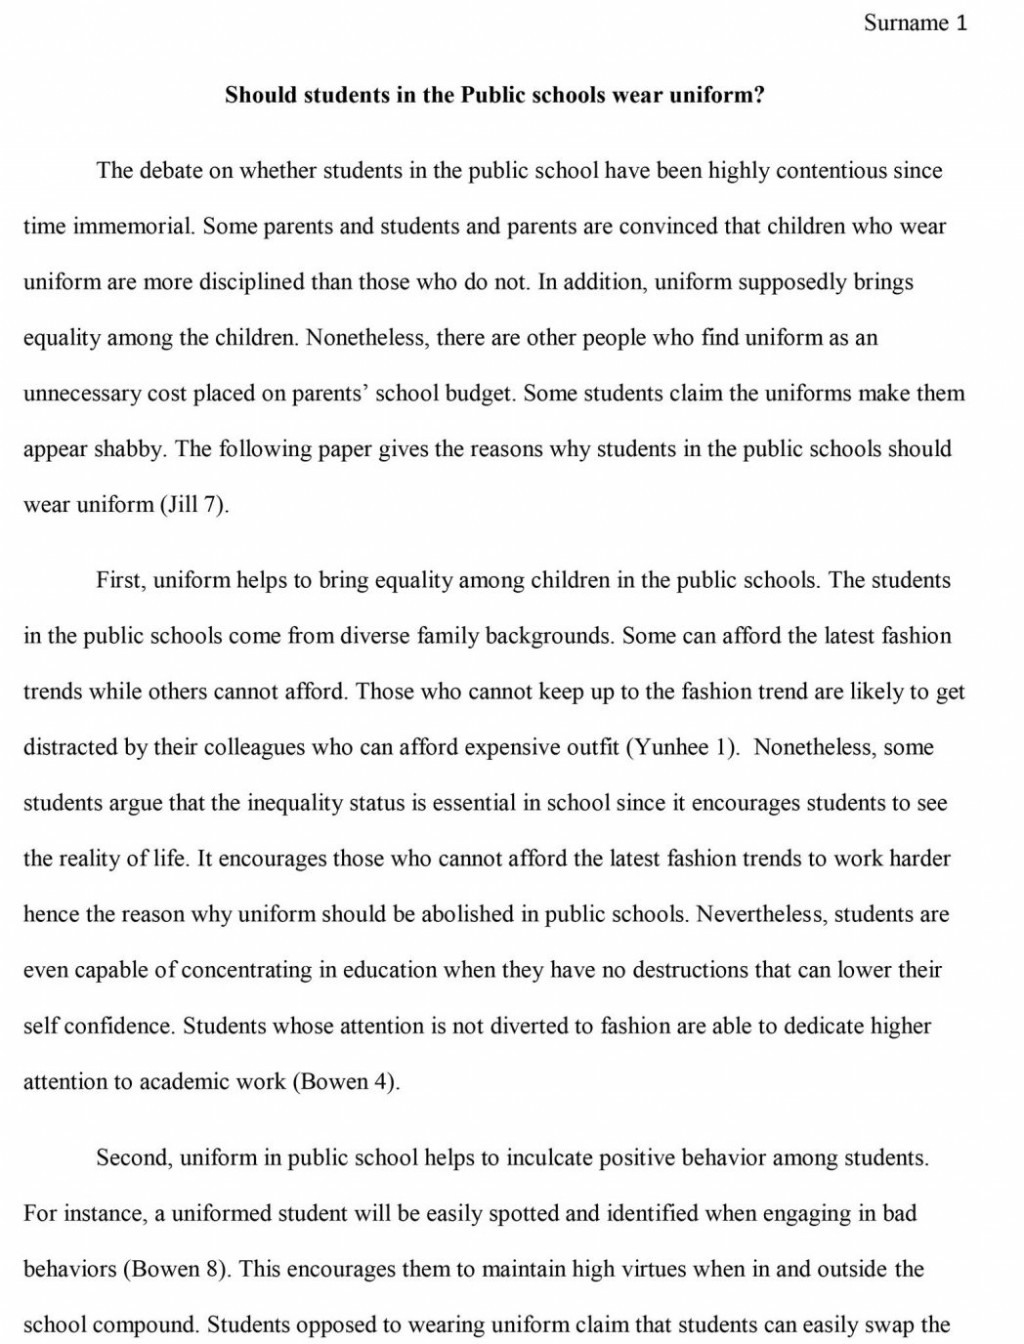 006 School Uniforms Argumentative Essay Sample Essaysmasters Public Educat Topics Curriculum System Canteen Education Funding Army 1048x1376 Uniform Sensational Is Compulsory In Hindi Conclusion Large